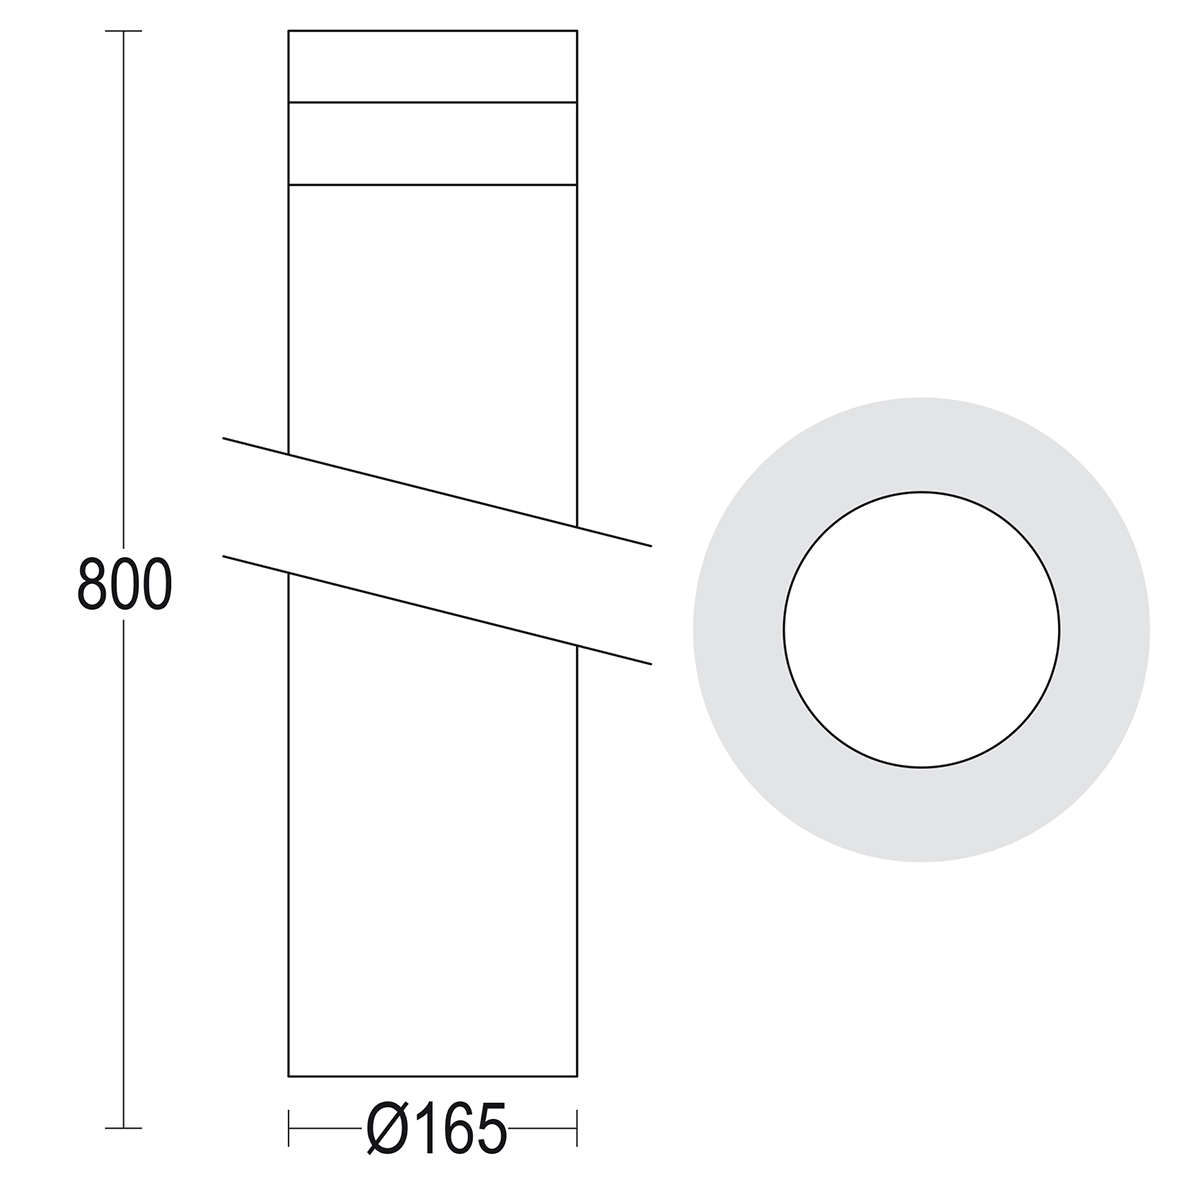 чертеж Maxitondo 800 Ghidini уличный светильник GH1374.FAXT400EN